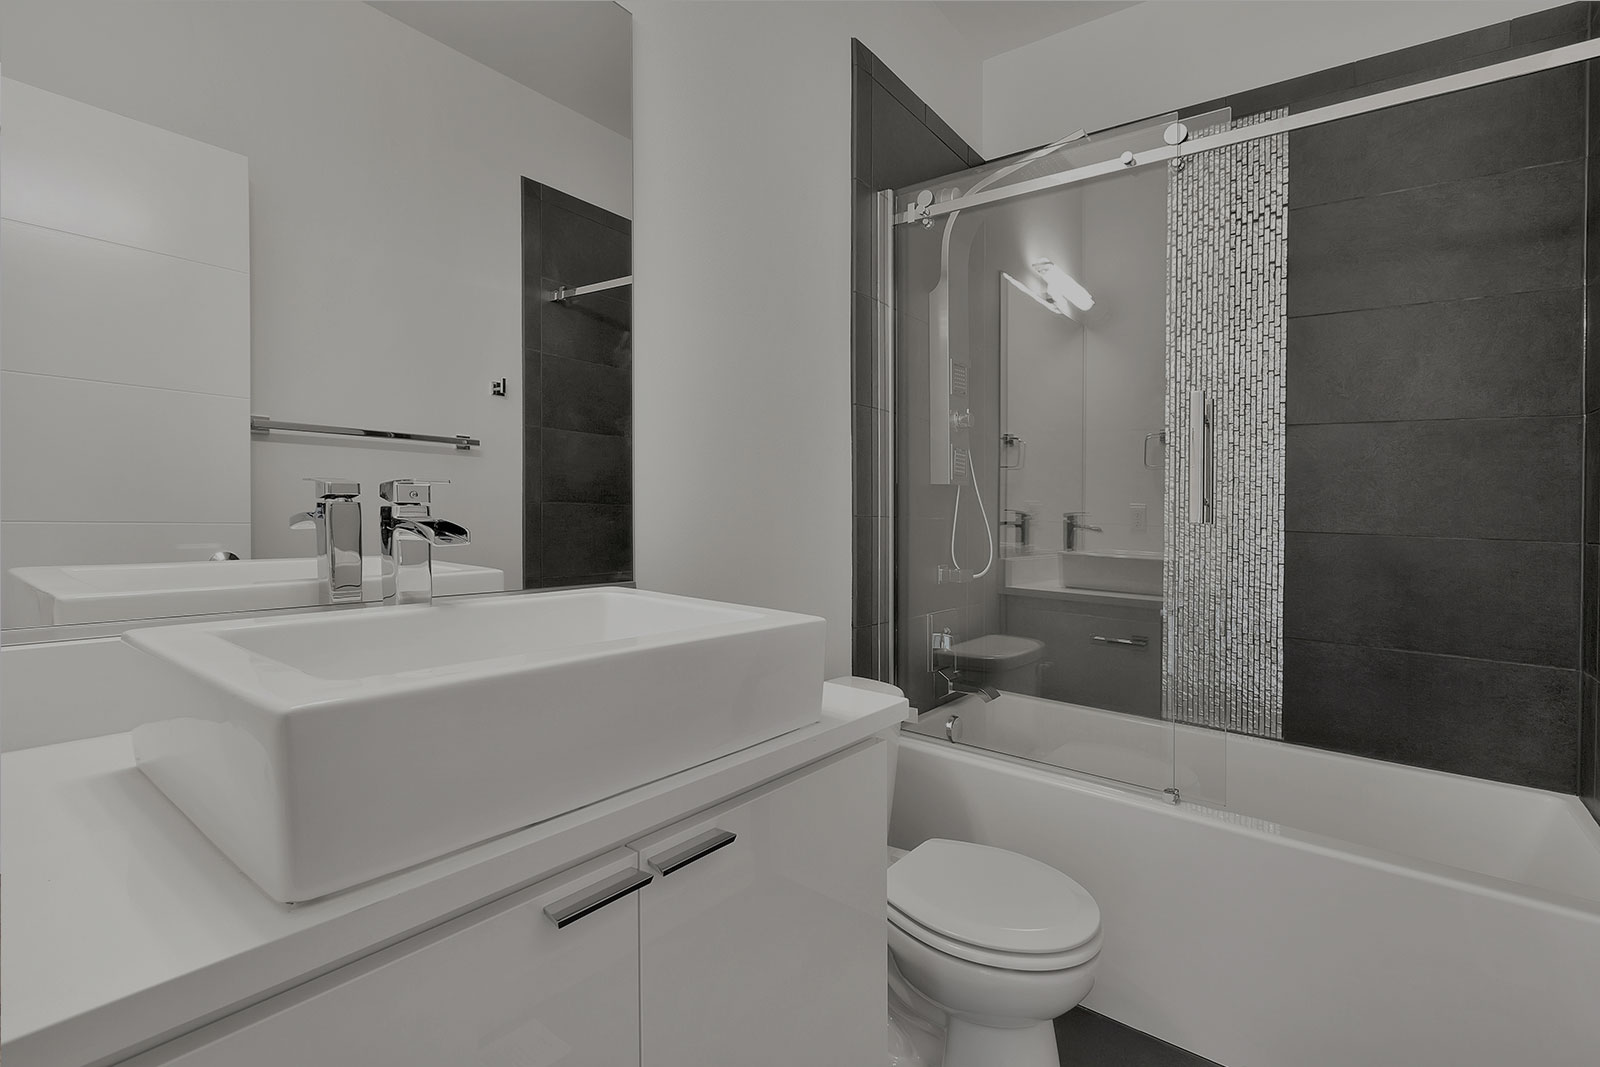 Newly renovated bathroom in Sydney